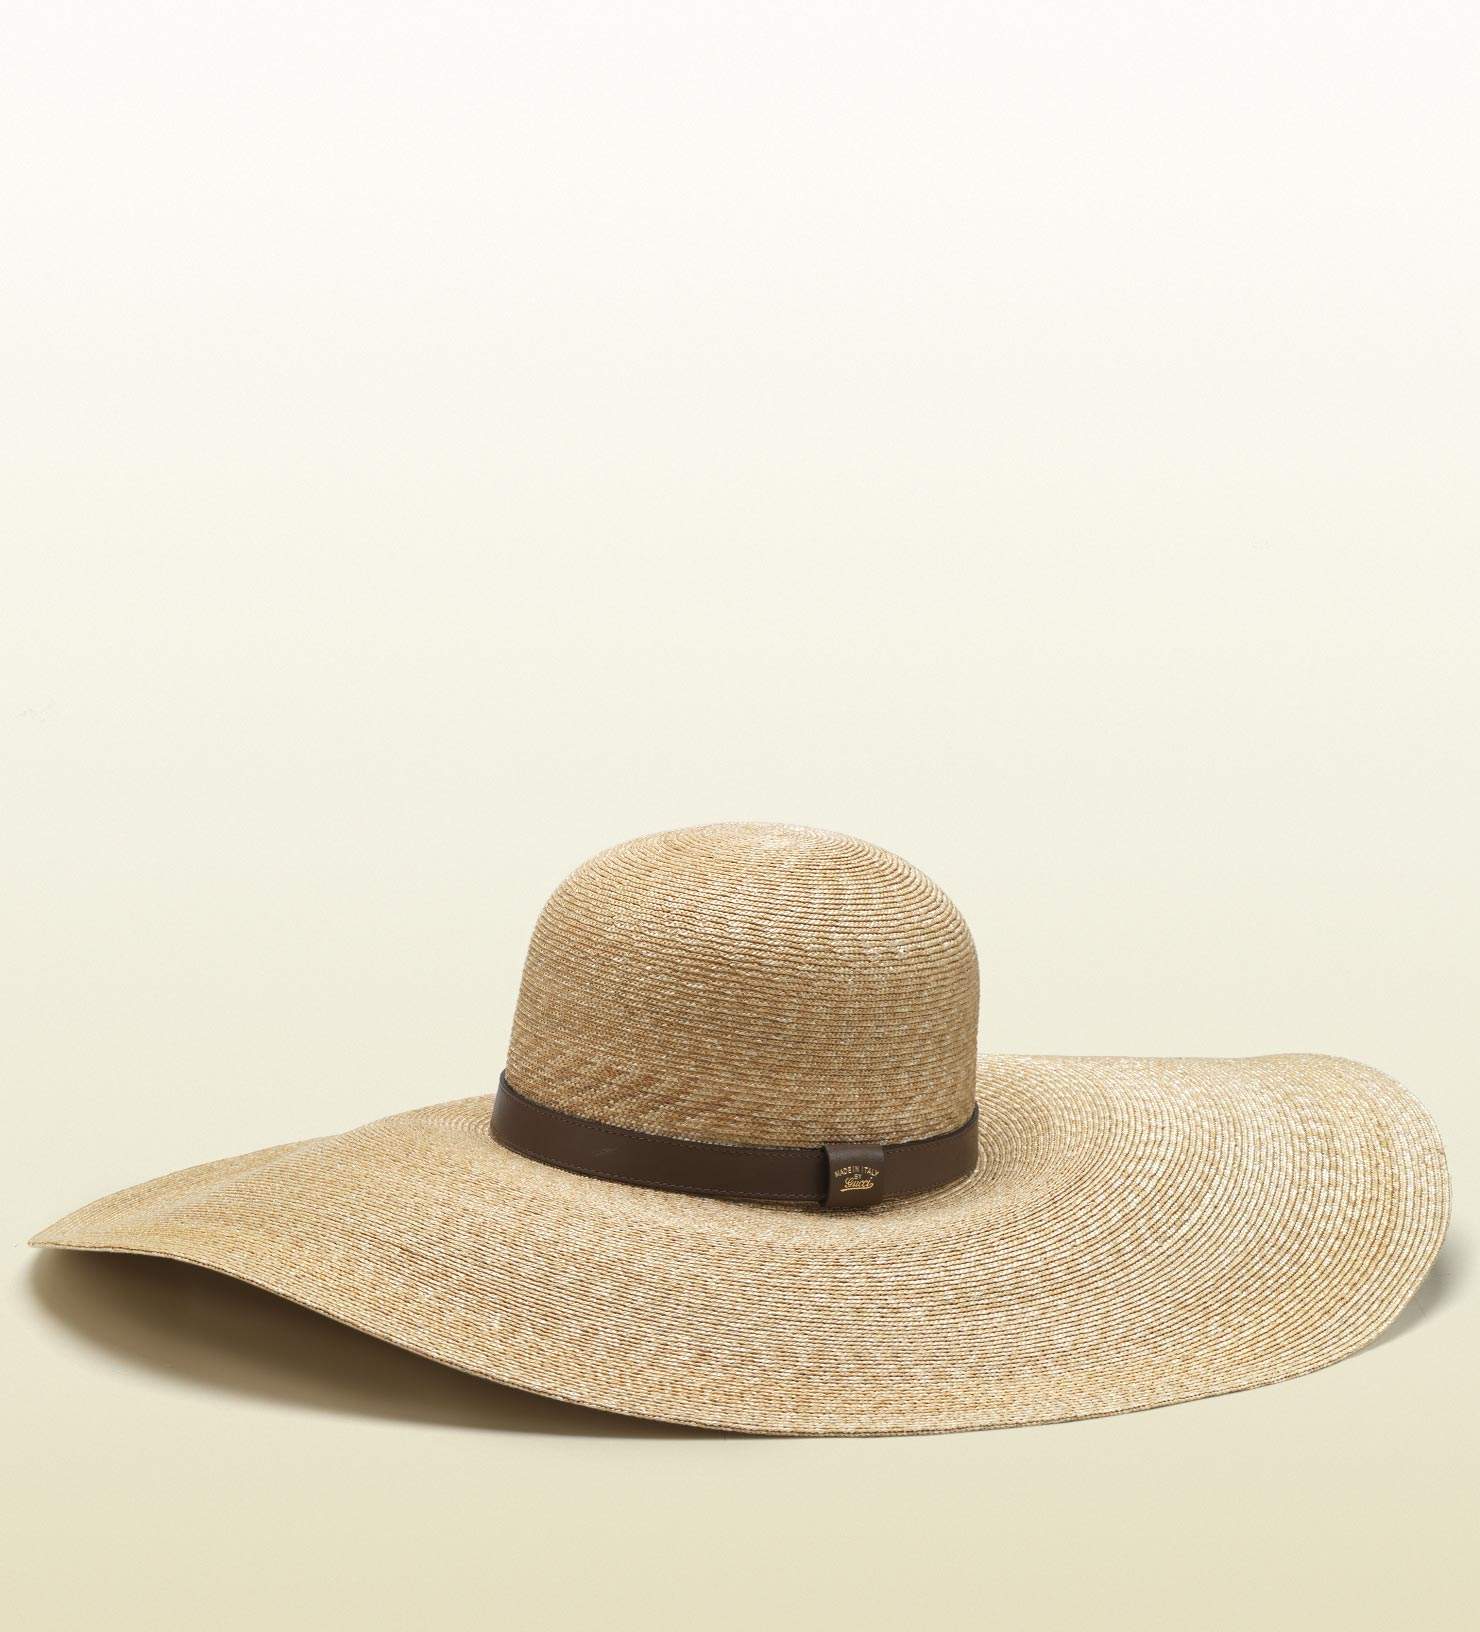 c61273d90d44f Gucci Natural Straw Wide Brim Hat in Natural - Lyst